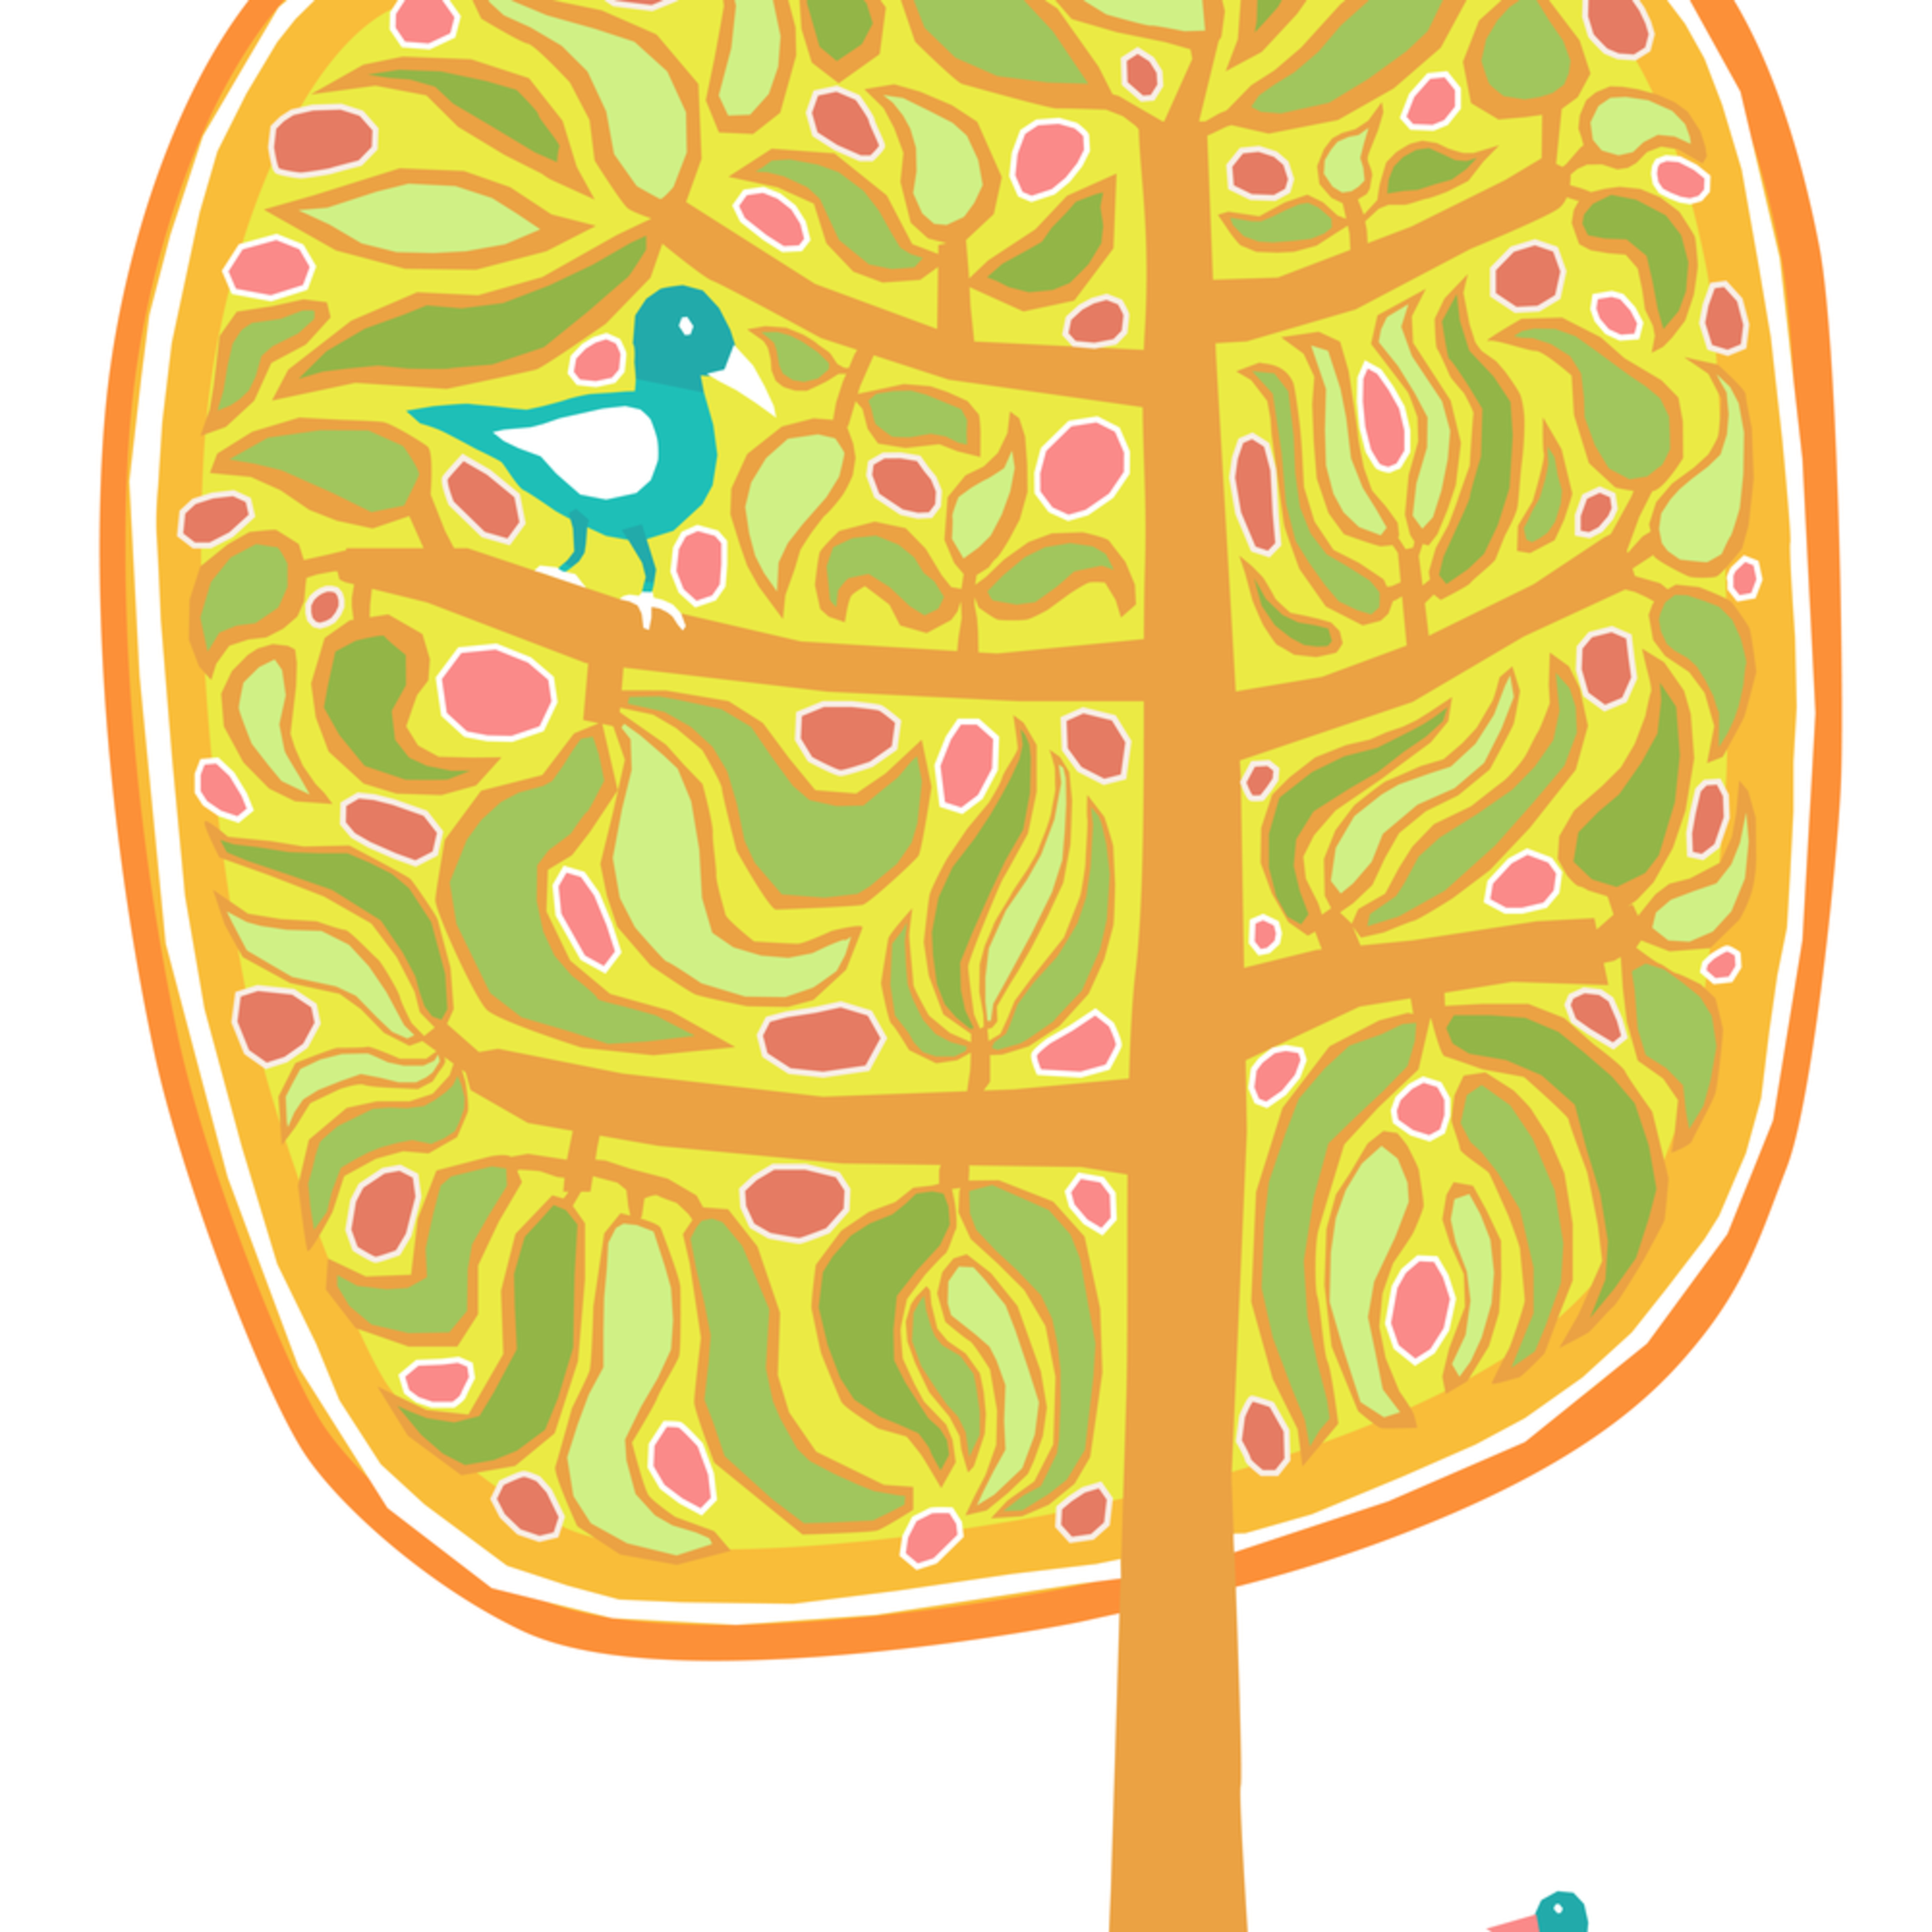 Fantasy fruit tree by andrew daniel tcpqe2